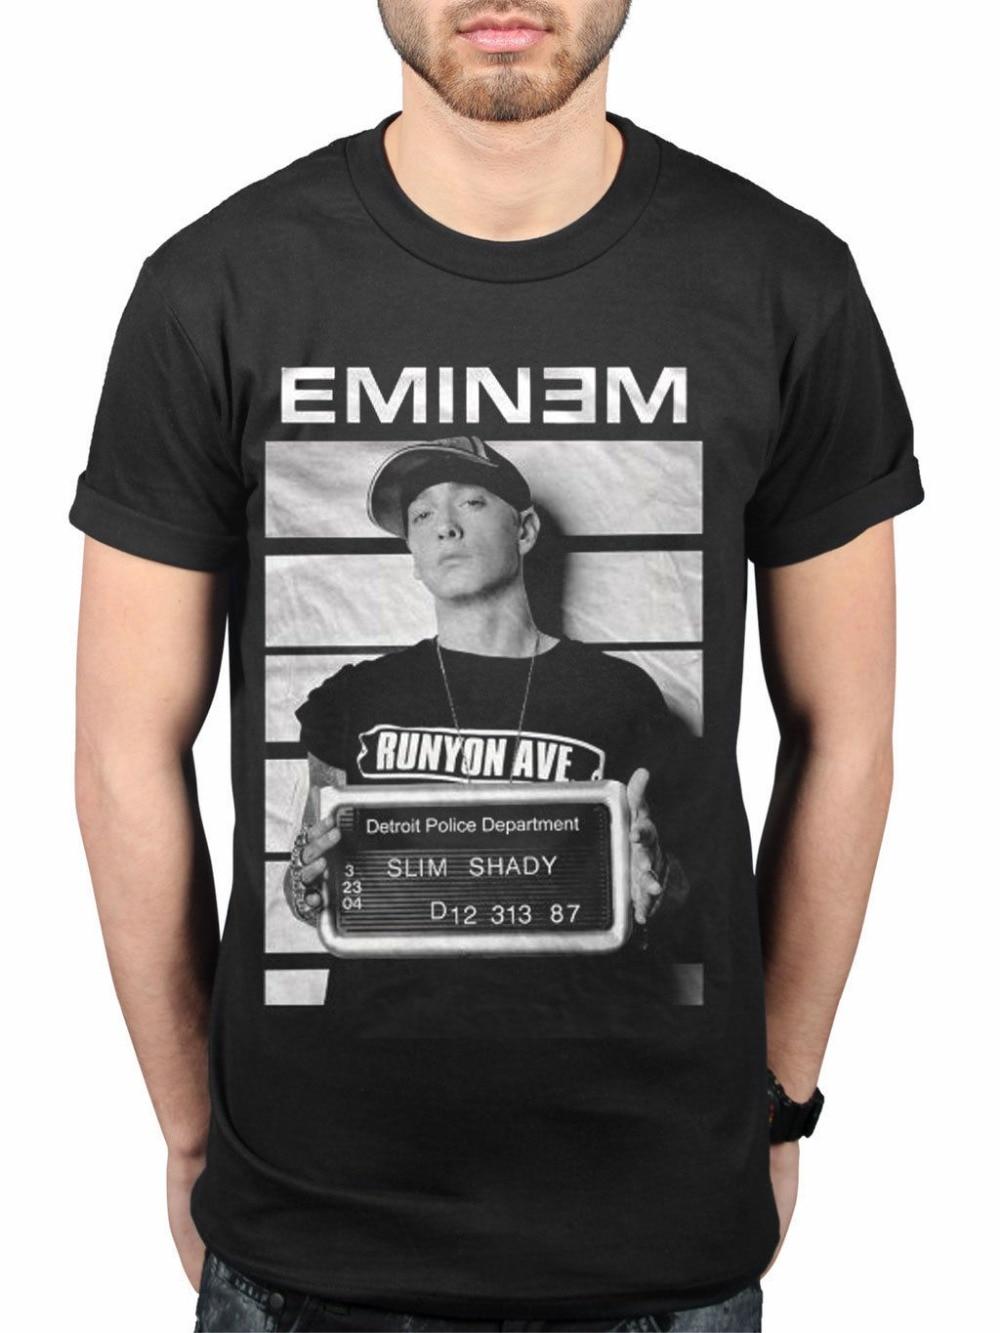 T Shirt Design Website Fashion Eminem Arrest New Graphic T Shirt